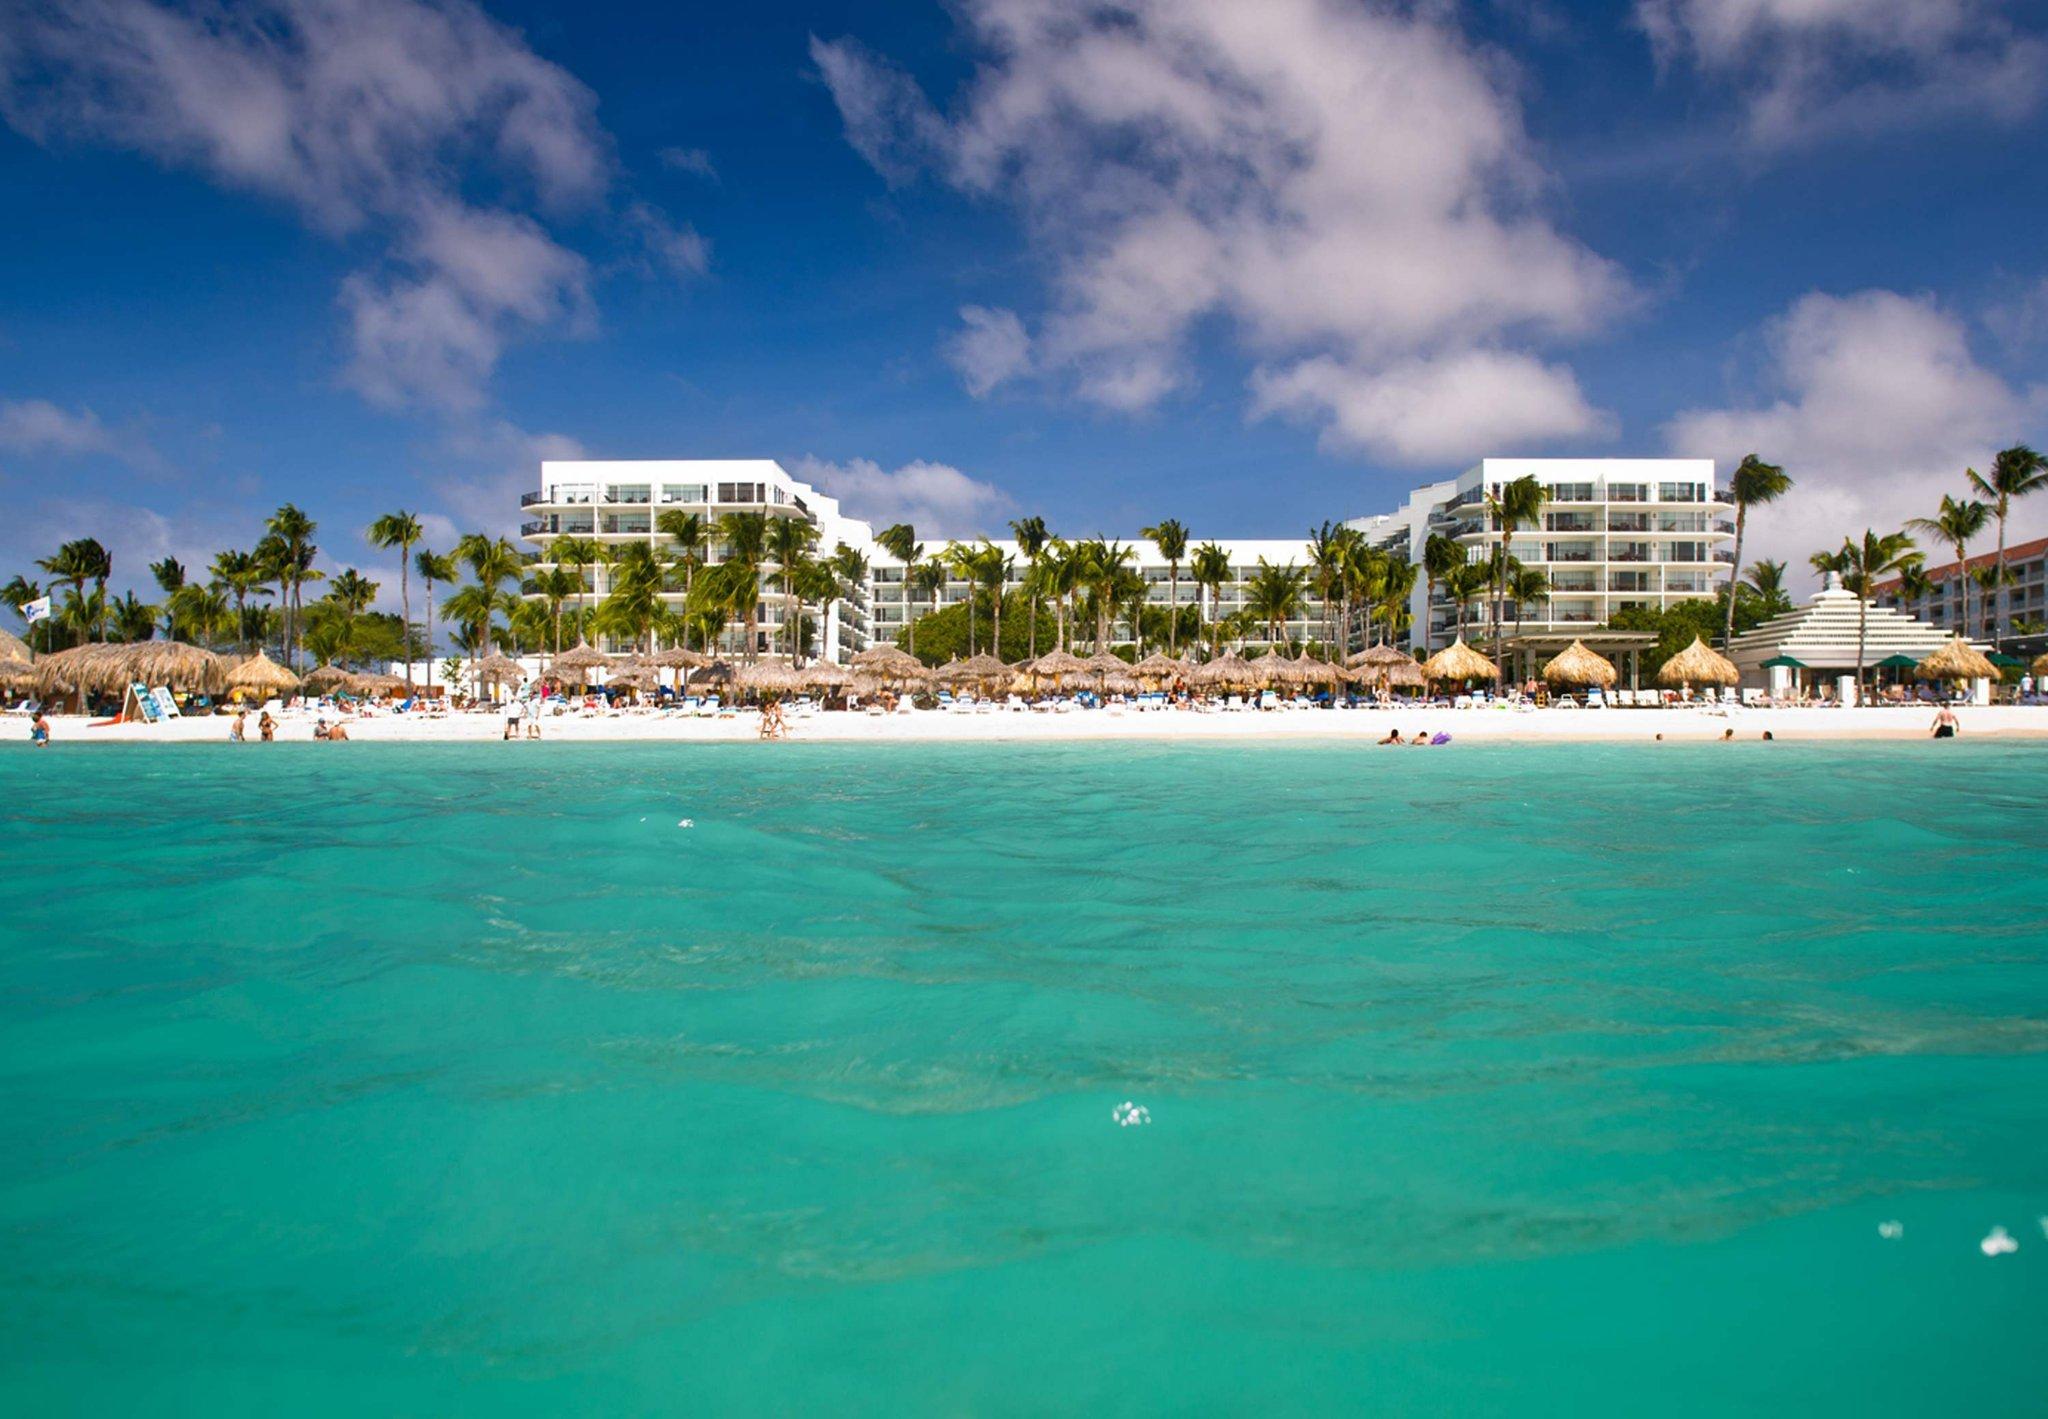 Casino palm beach aruba